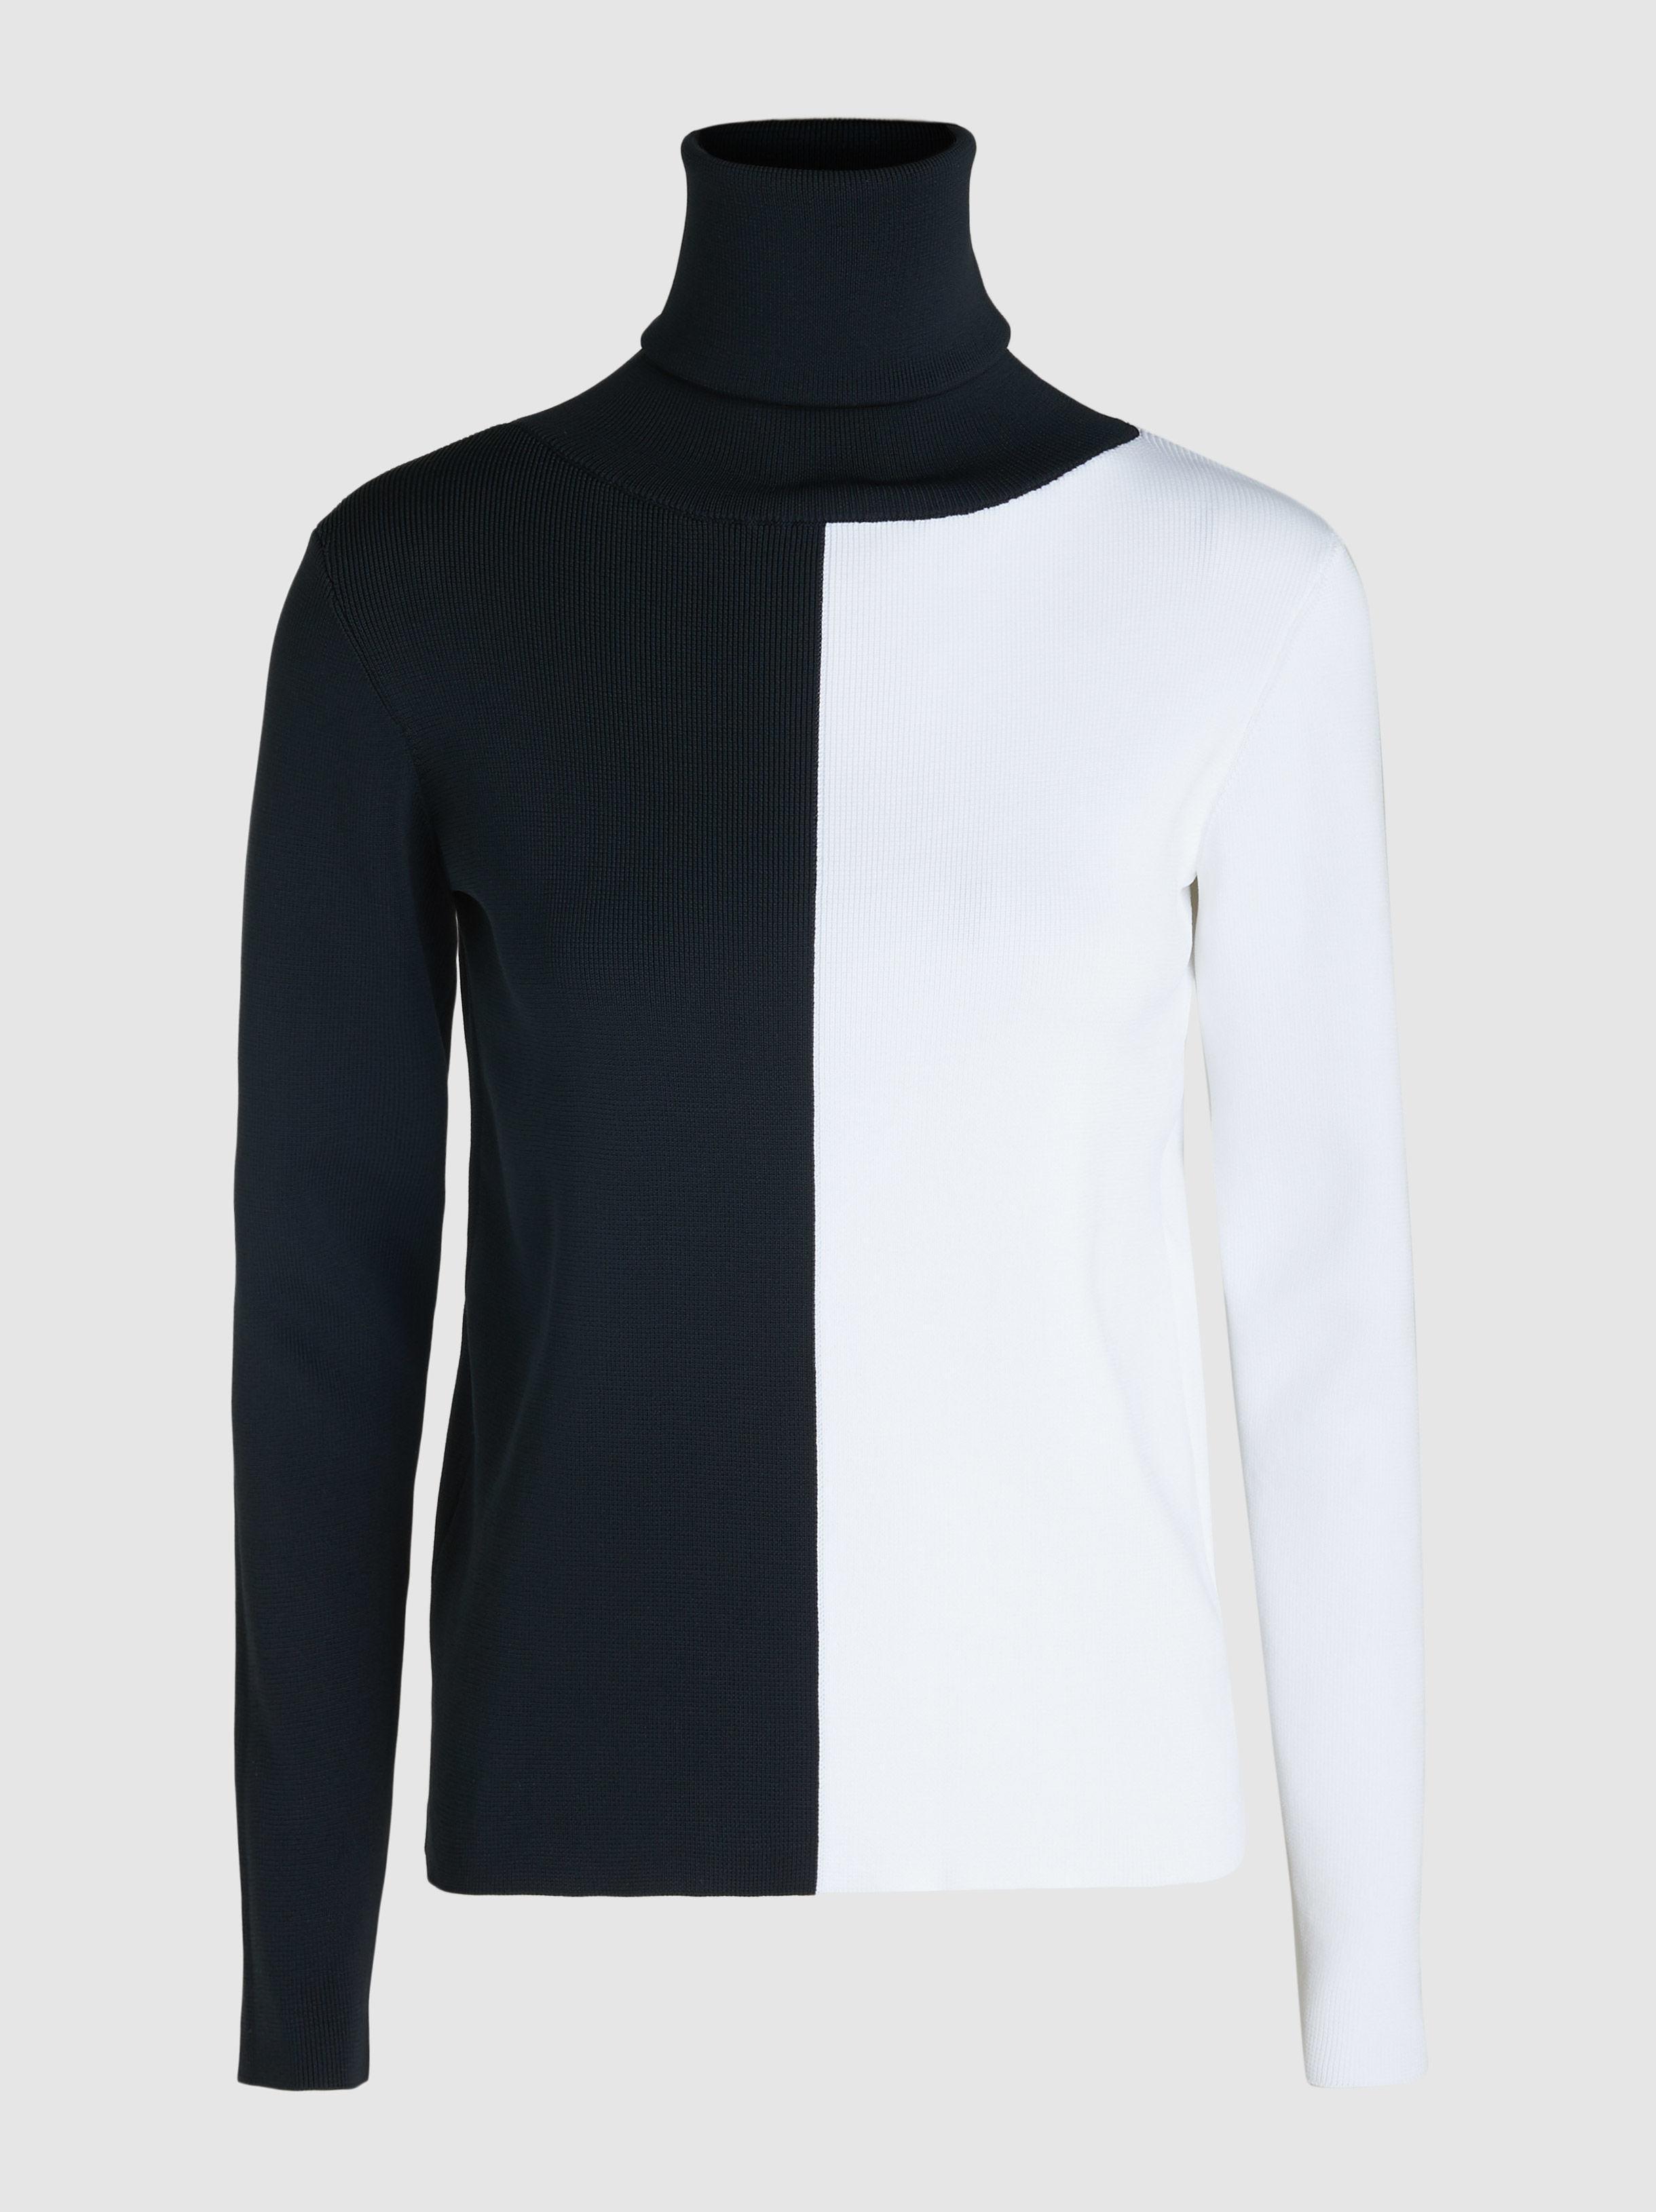 9b8b81fb720453 Lyst - Simon Miller Berto Two-tone Fine-knit Turtleneck in Black